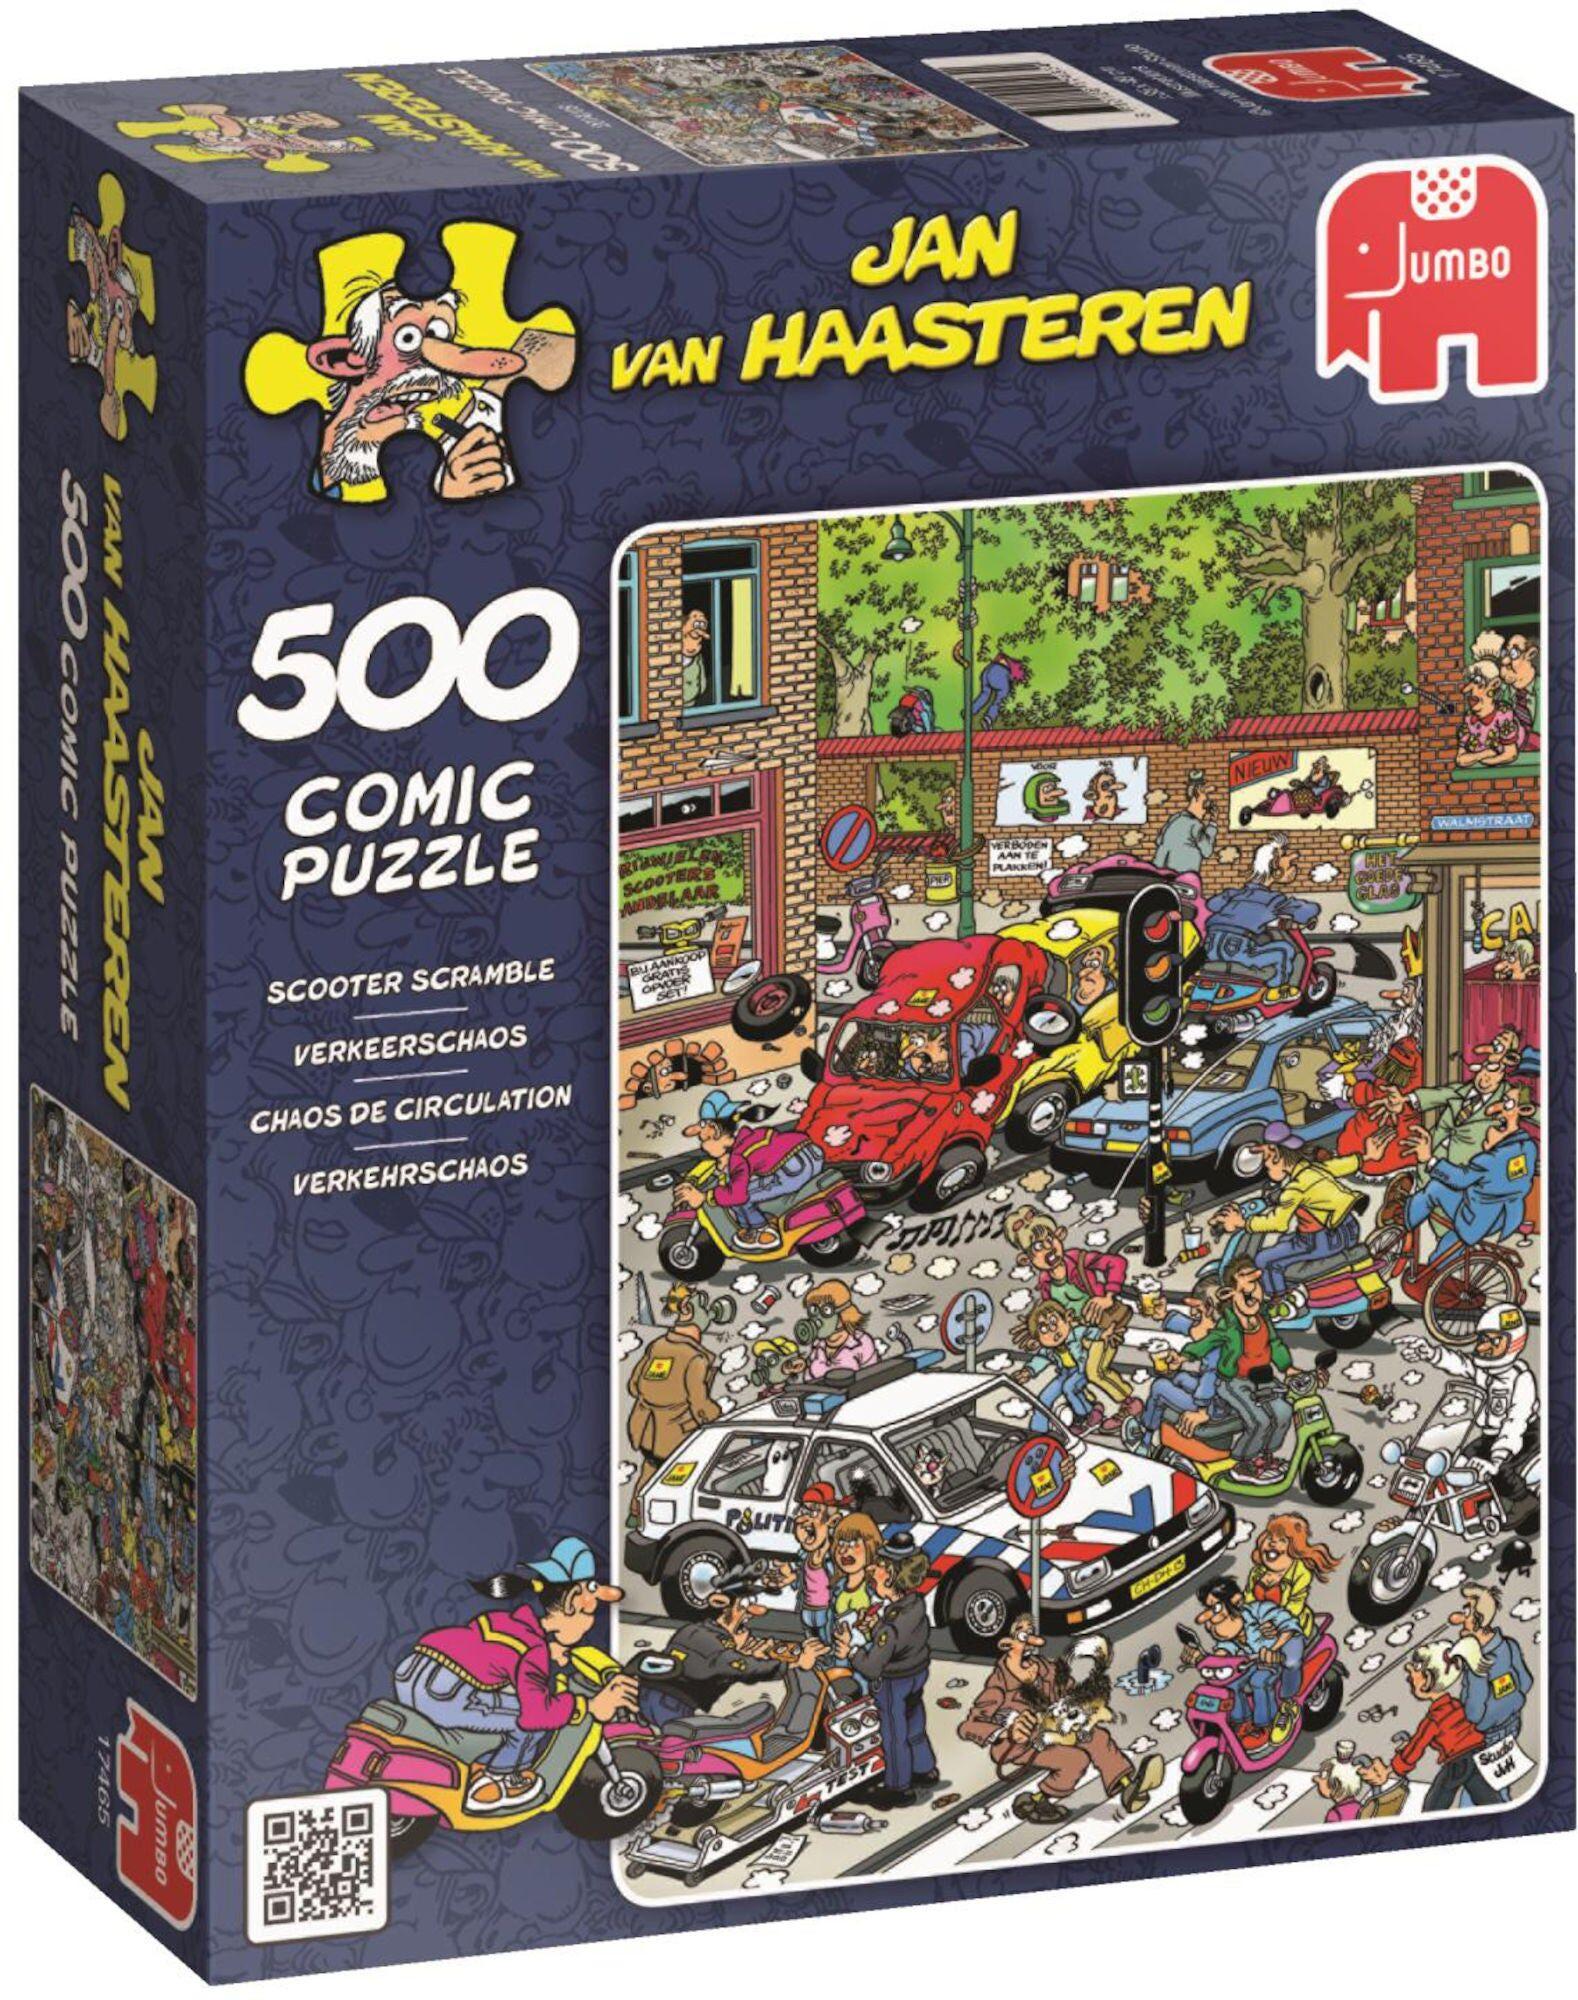 Jumbo Puslespill Jan van Haasteren Scooter Scramble 500